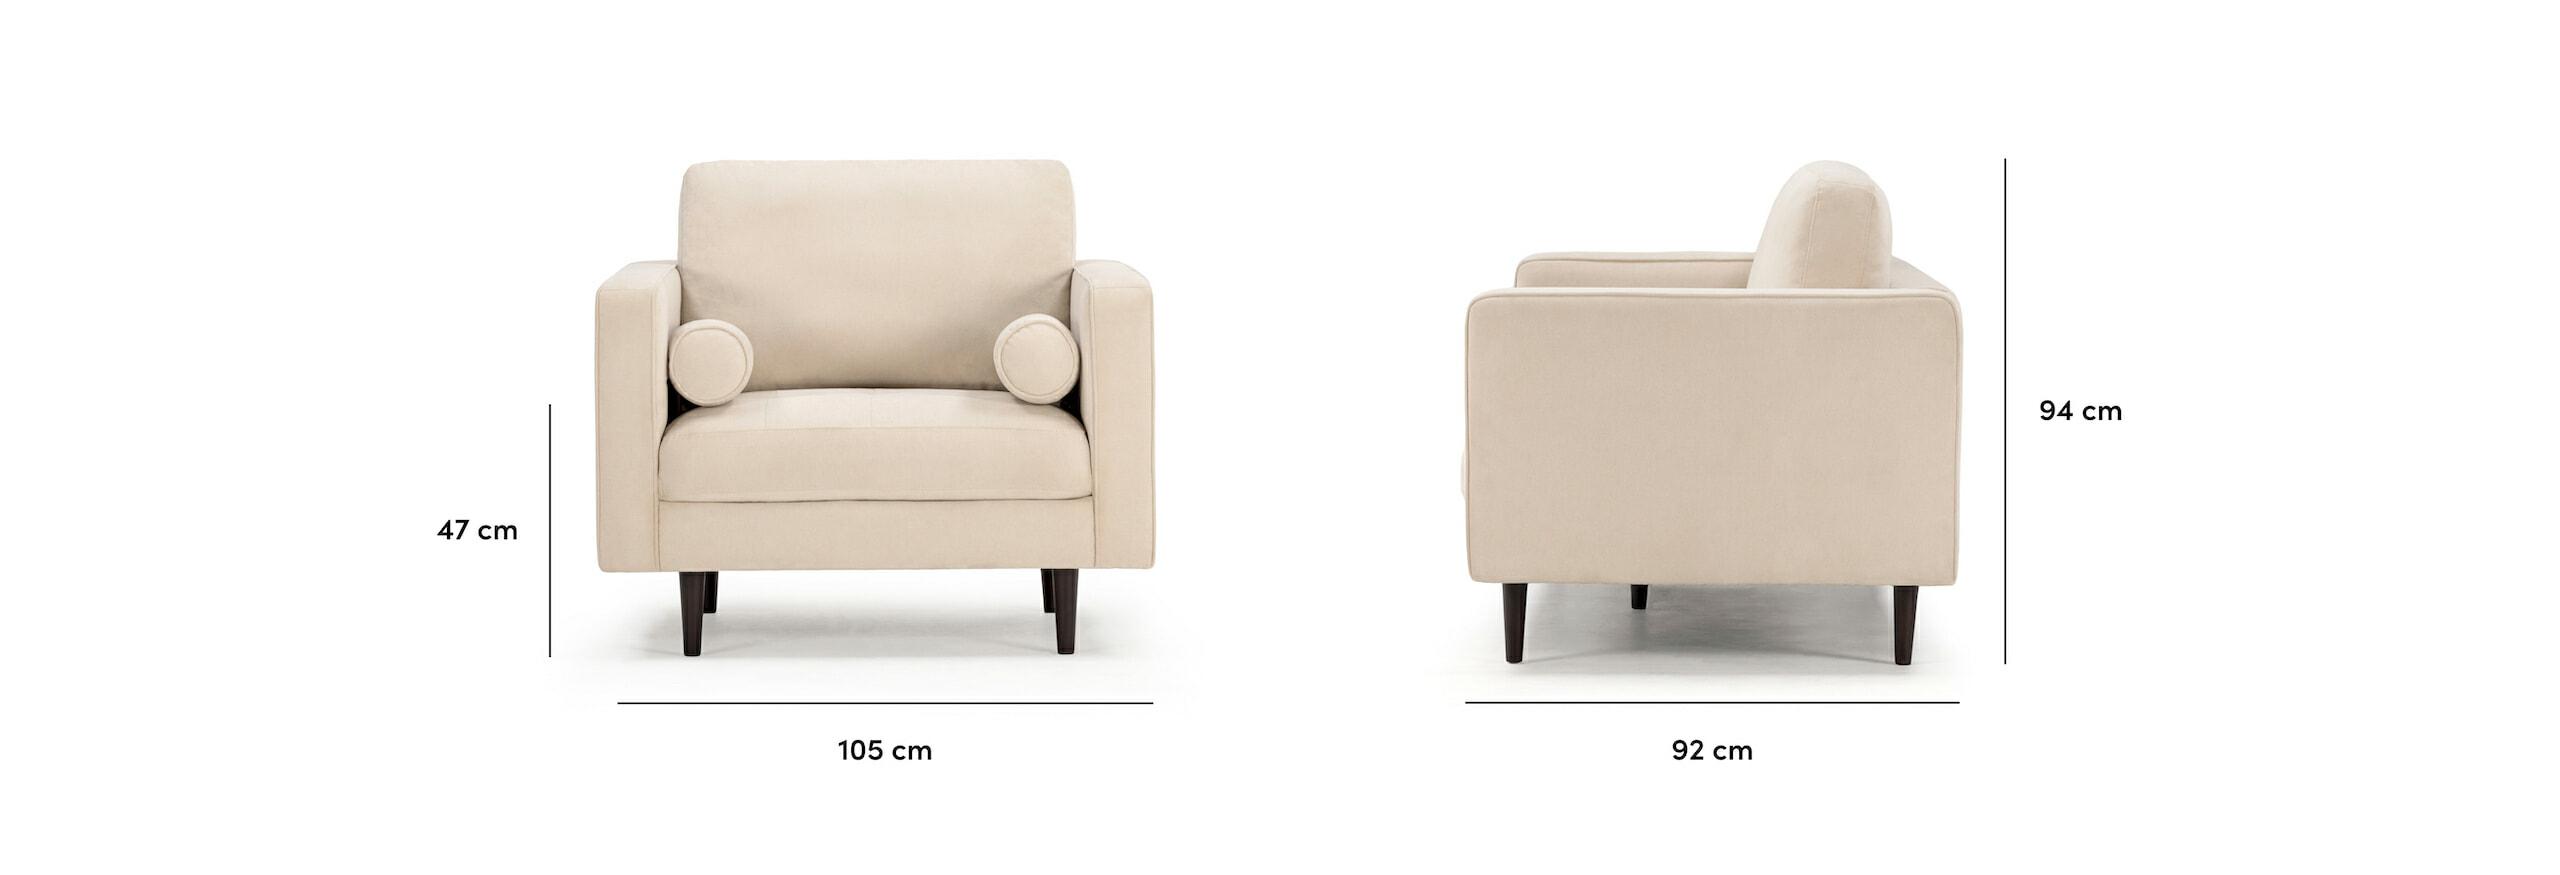 Soho armchair dimensions